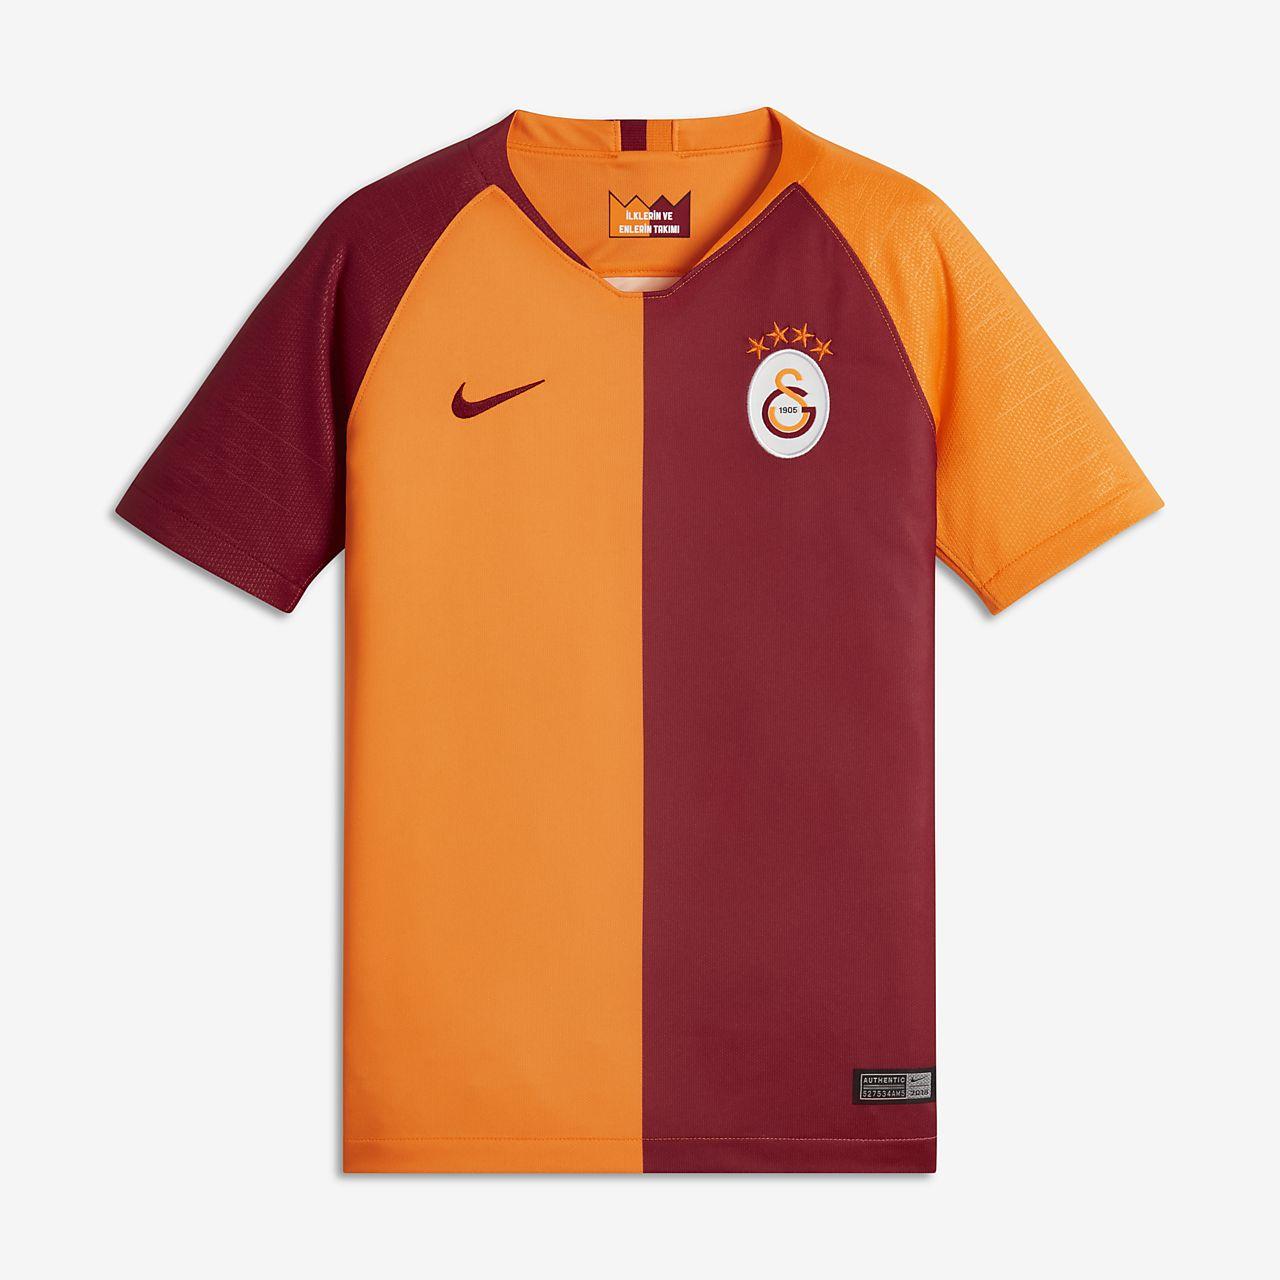 2018/19 Galatasaray S.K. Stadium Home Fußballtrikot für ältere Kinder